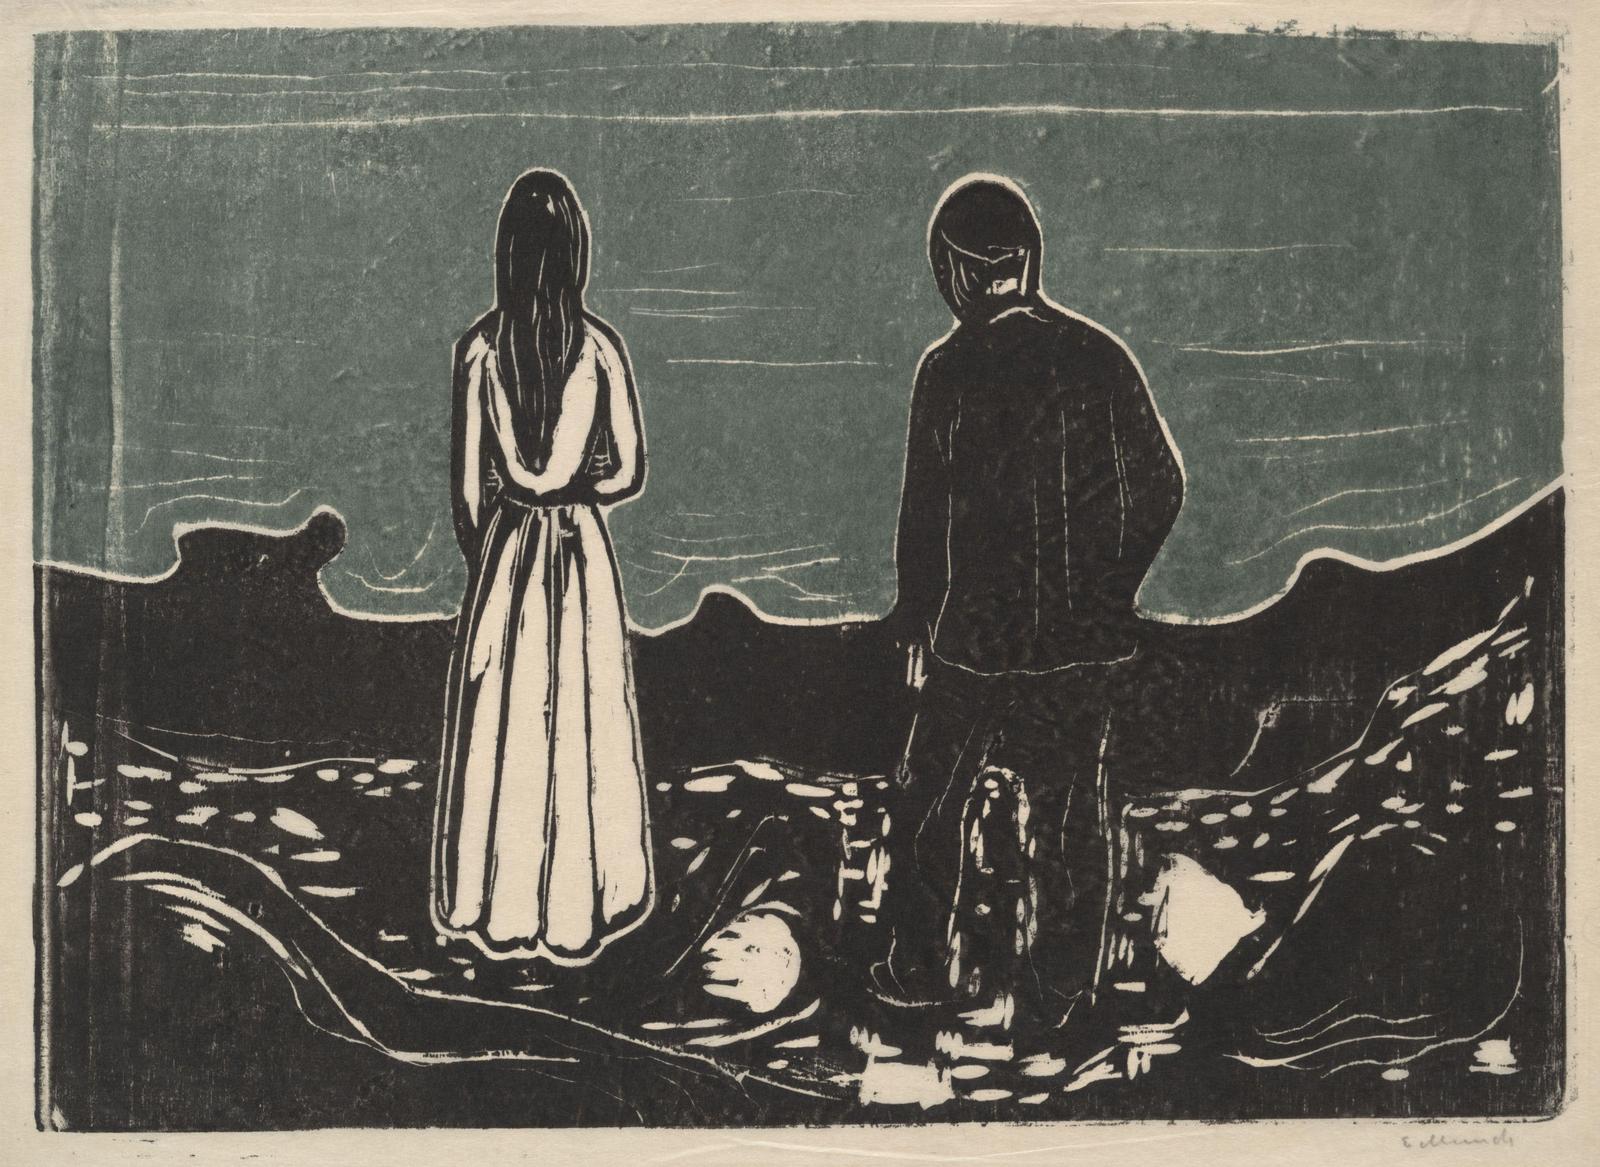 gravure:  Edward Munch